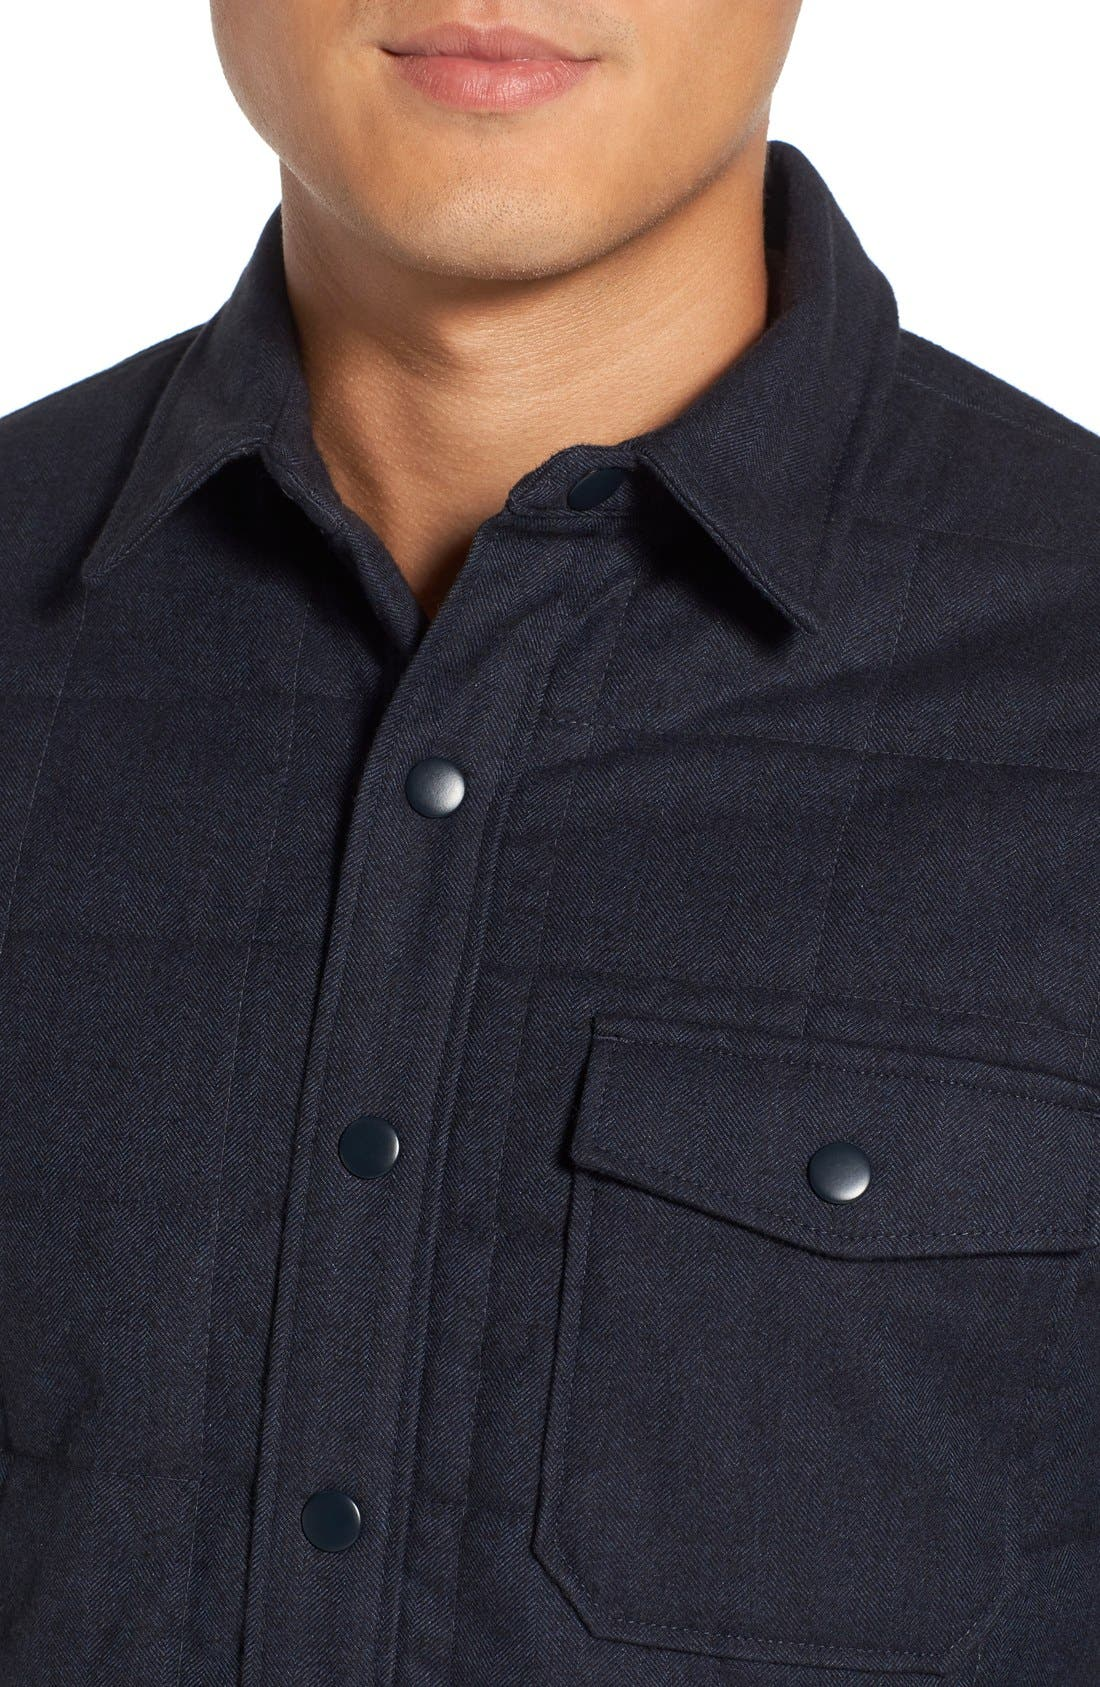 Quilted Herringbone Shirt Jacket,                             Alternate thumbnail 3, color,